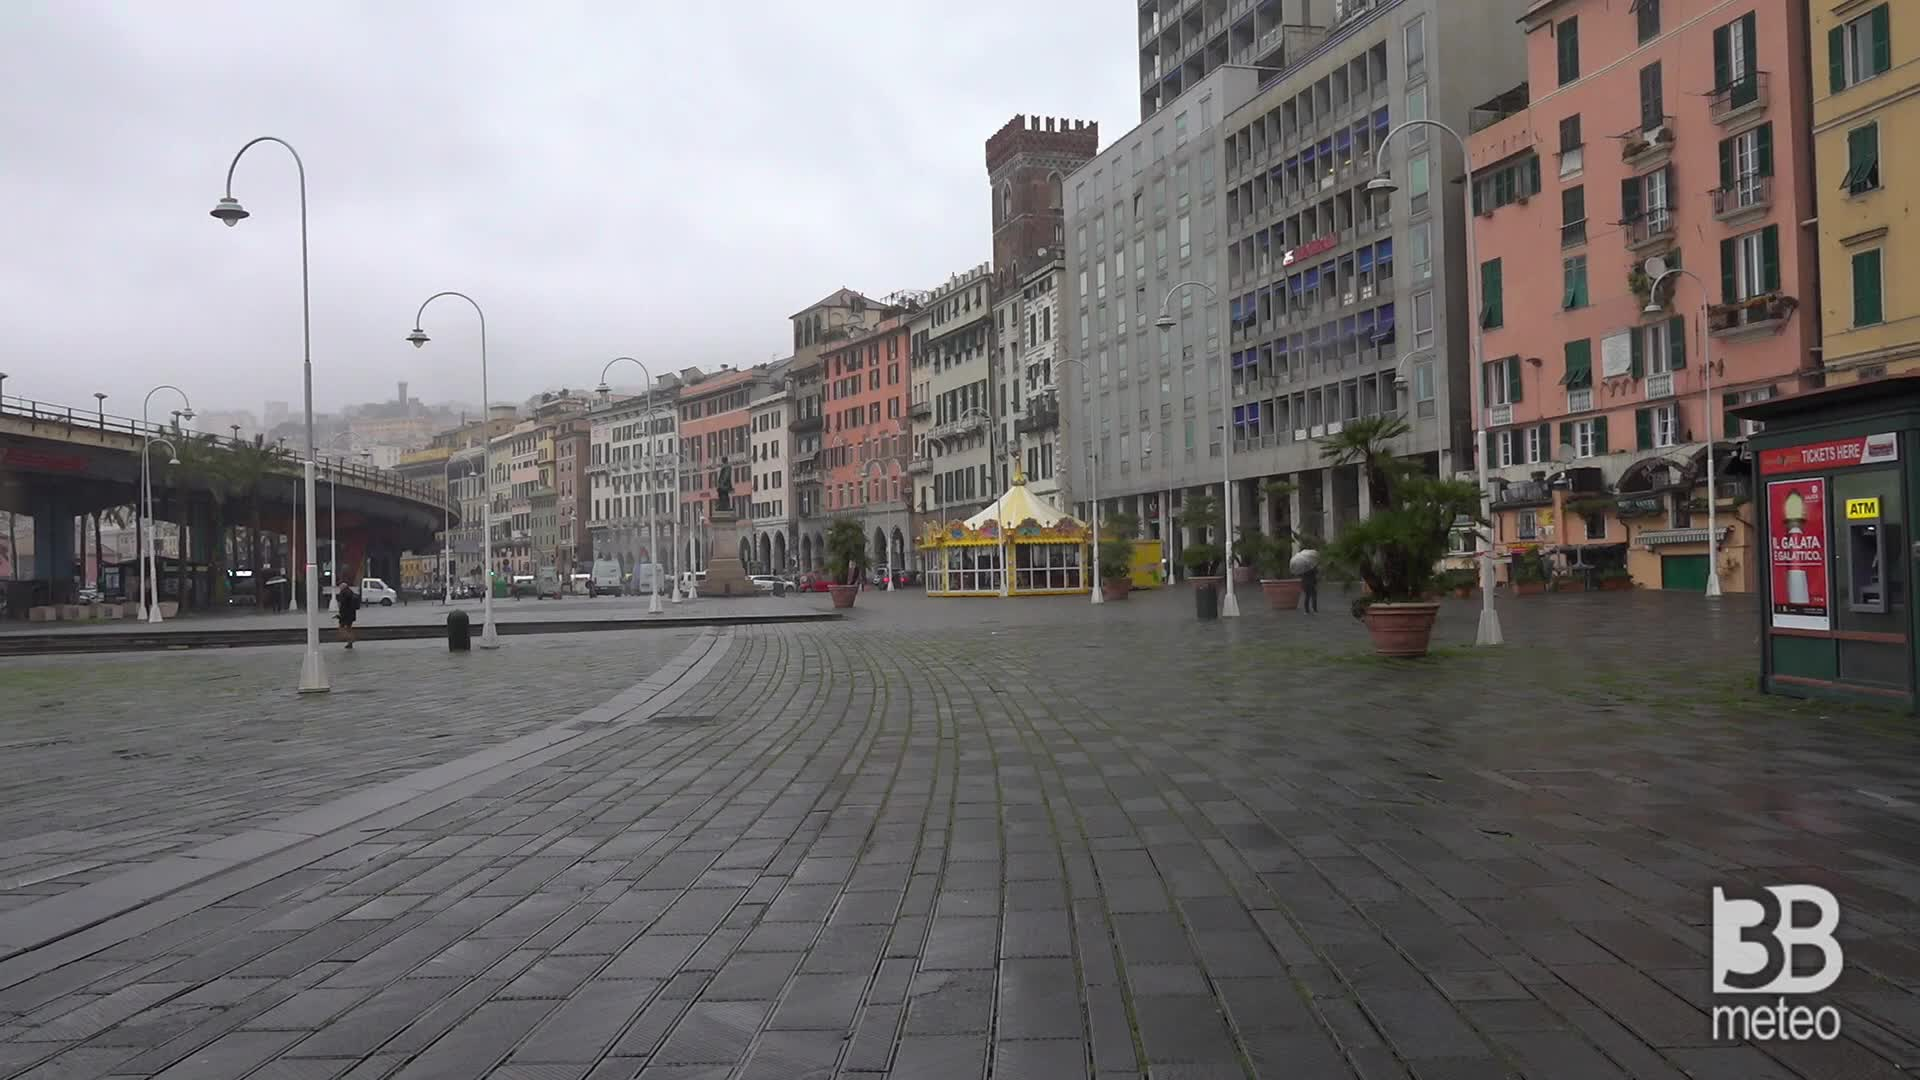 Genova, Coronavirus : Piazze deserte e controlli